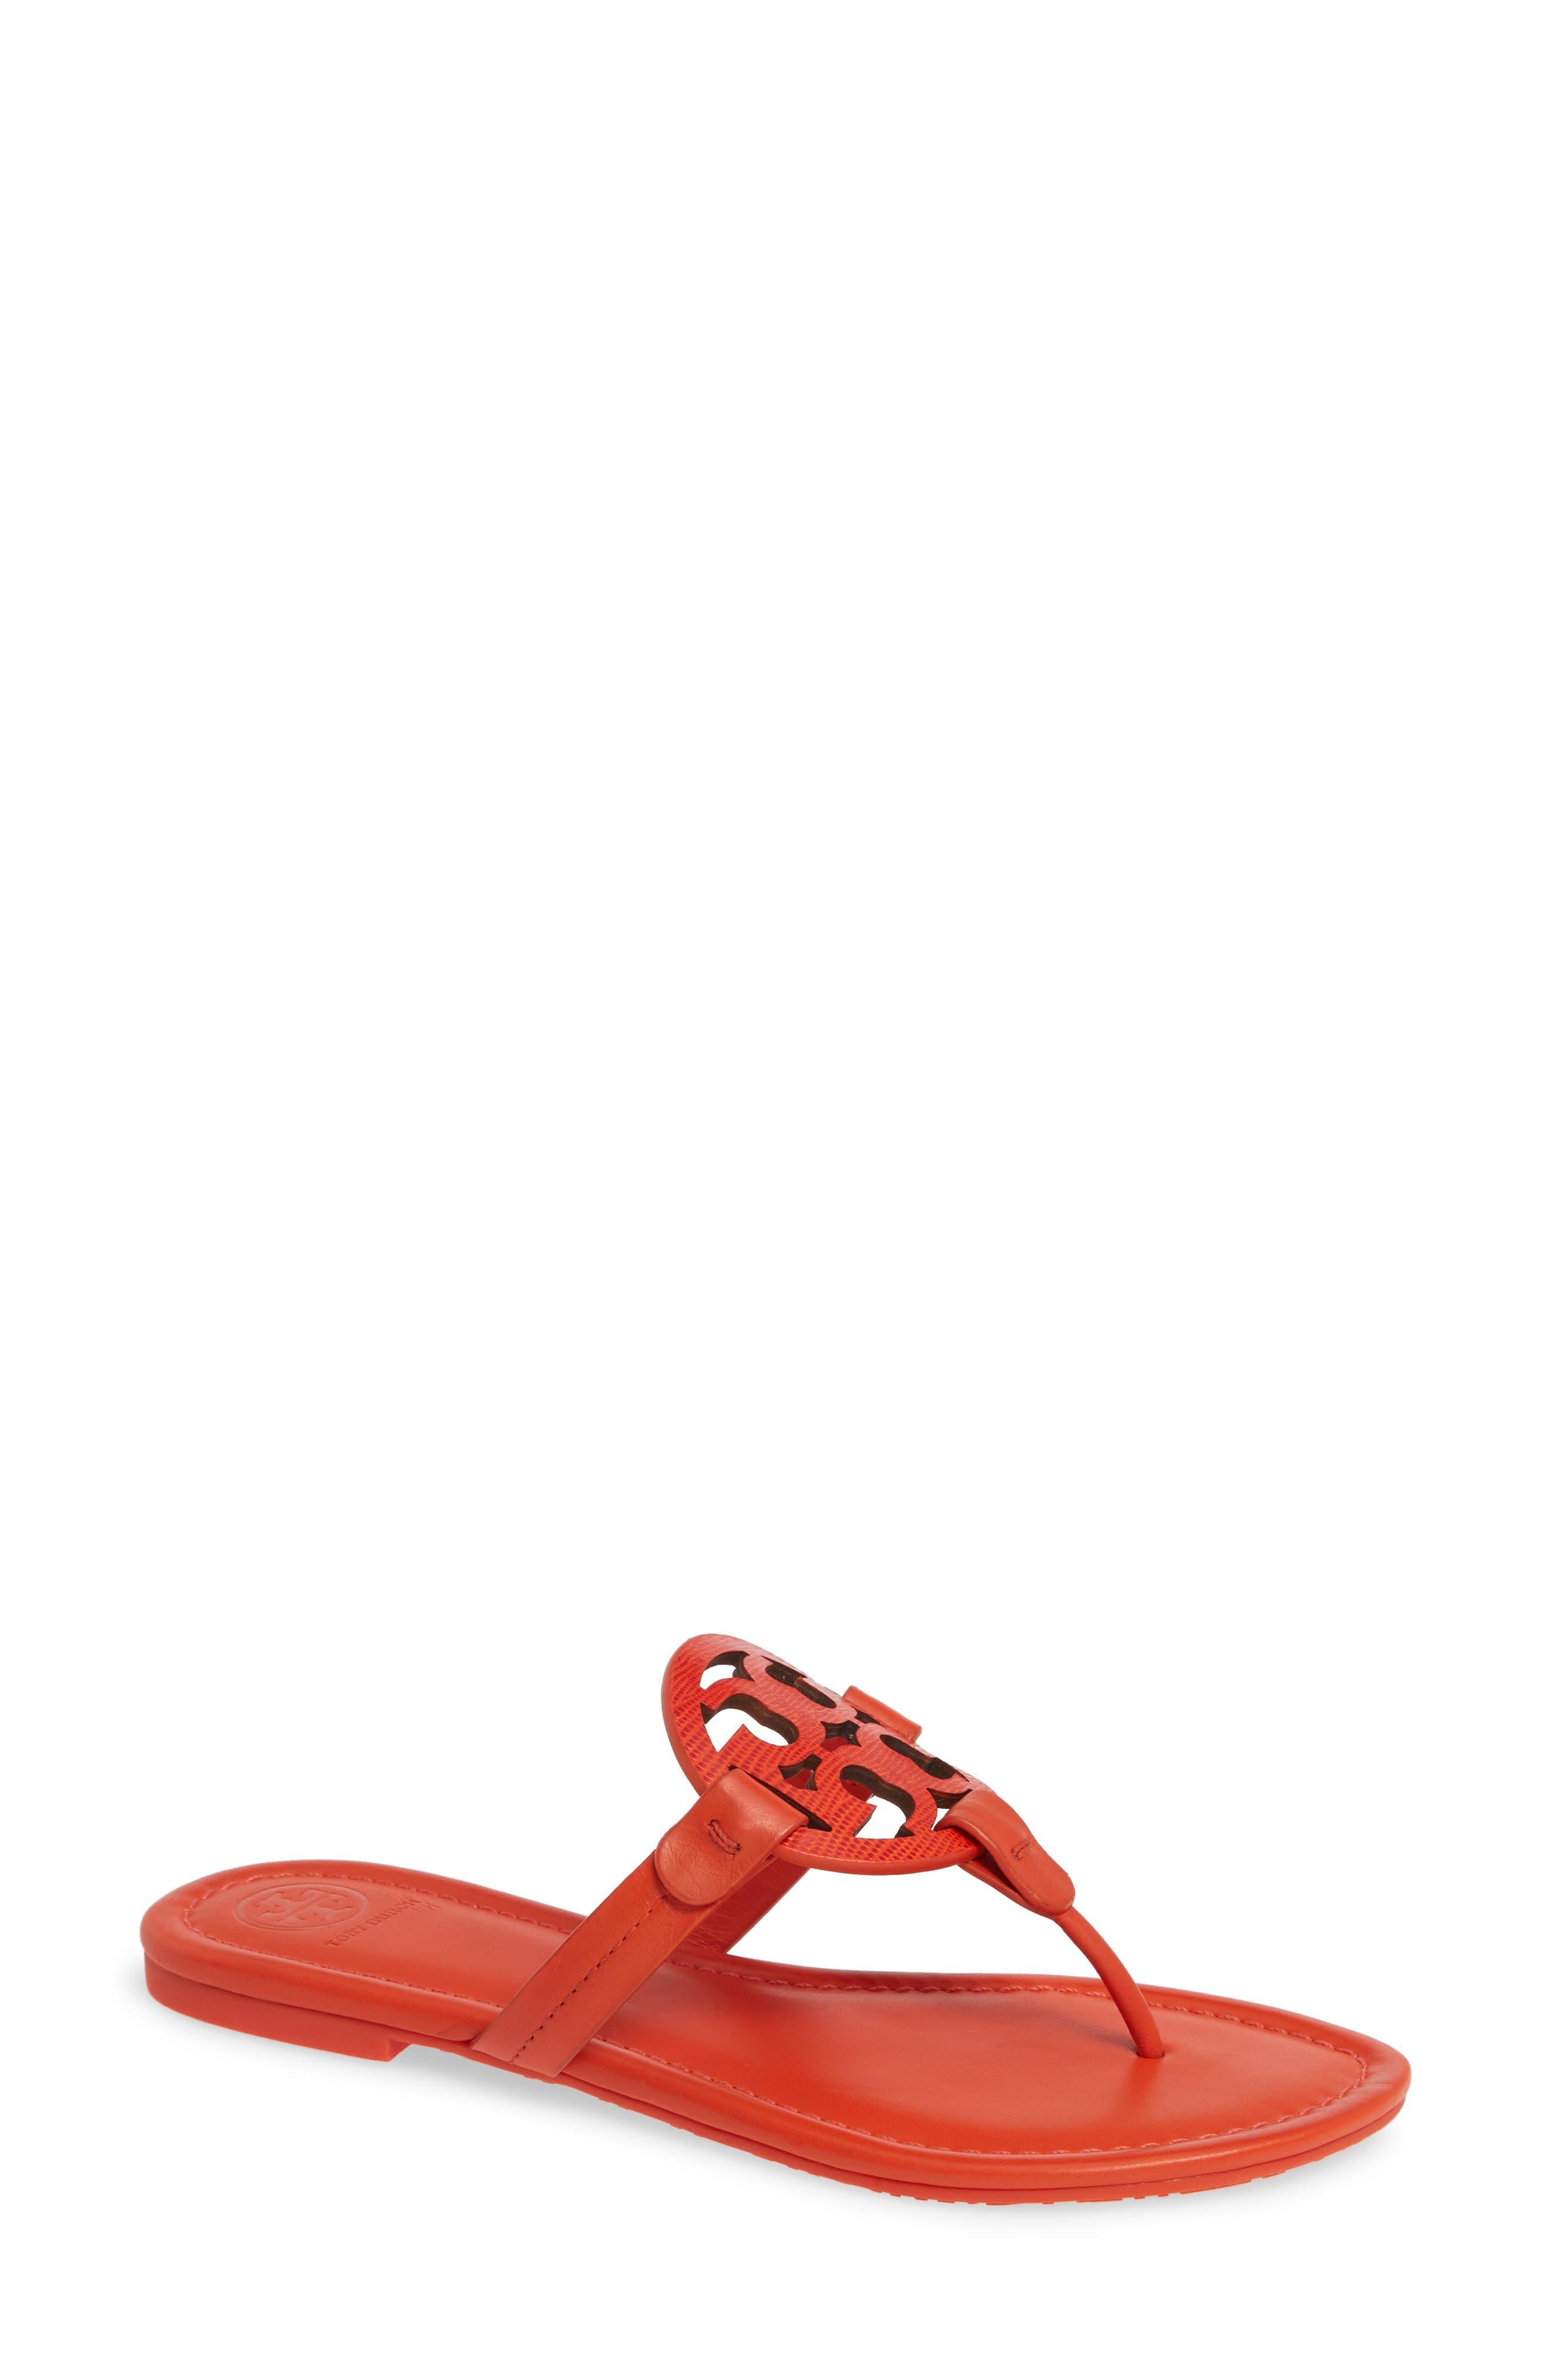 Tory Burch Miller Flip Flop- Orange